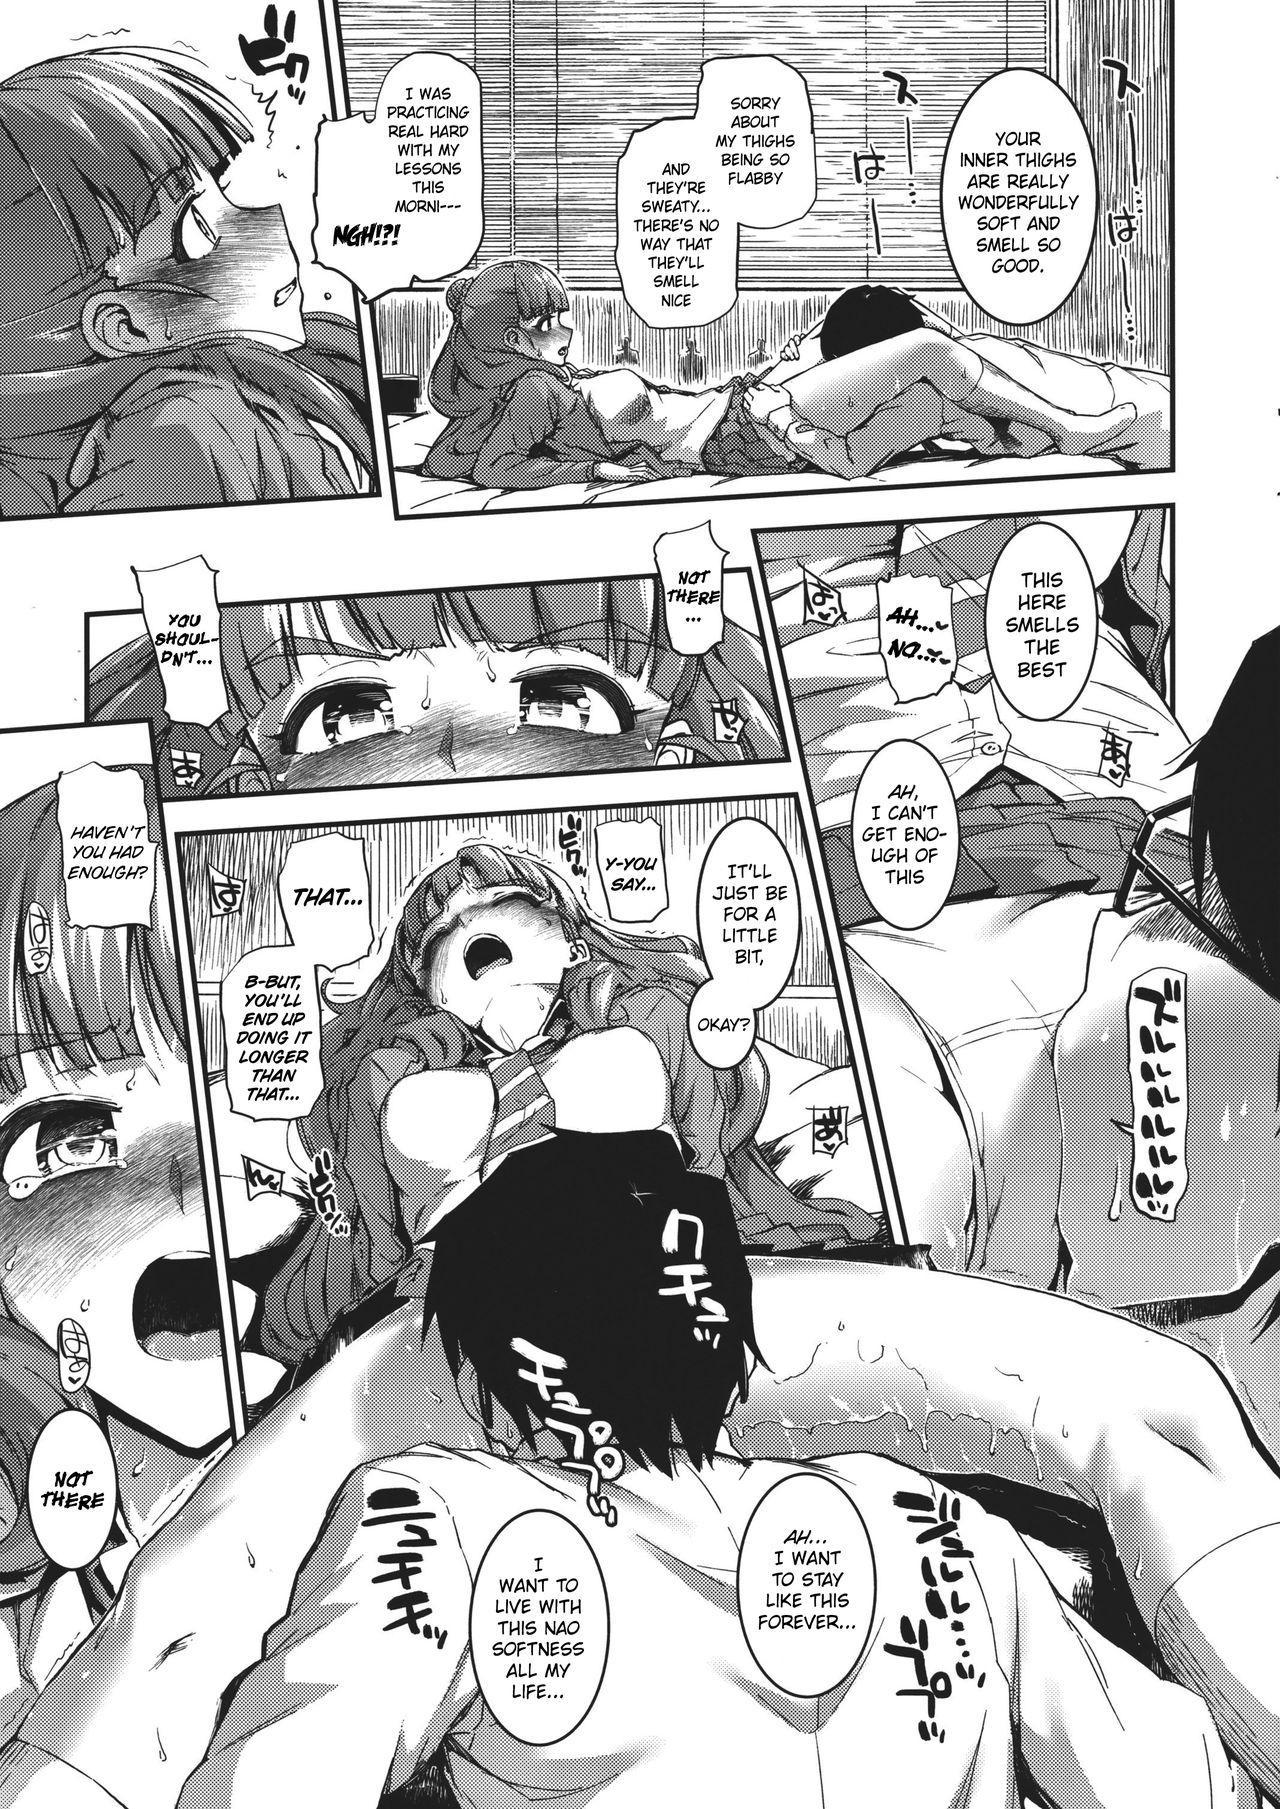 (COMIC1☆10) [Morimiyakan (Morimiya Masayuki)] Sarani, Nao-chan to Asedaku de Suru Hon | The getting all sweaty with Nao-chan book (THE IDOLM@STER CINDERELLA GIRLS) [English] 5